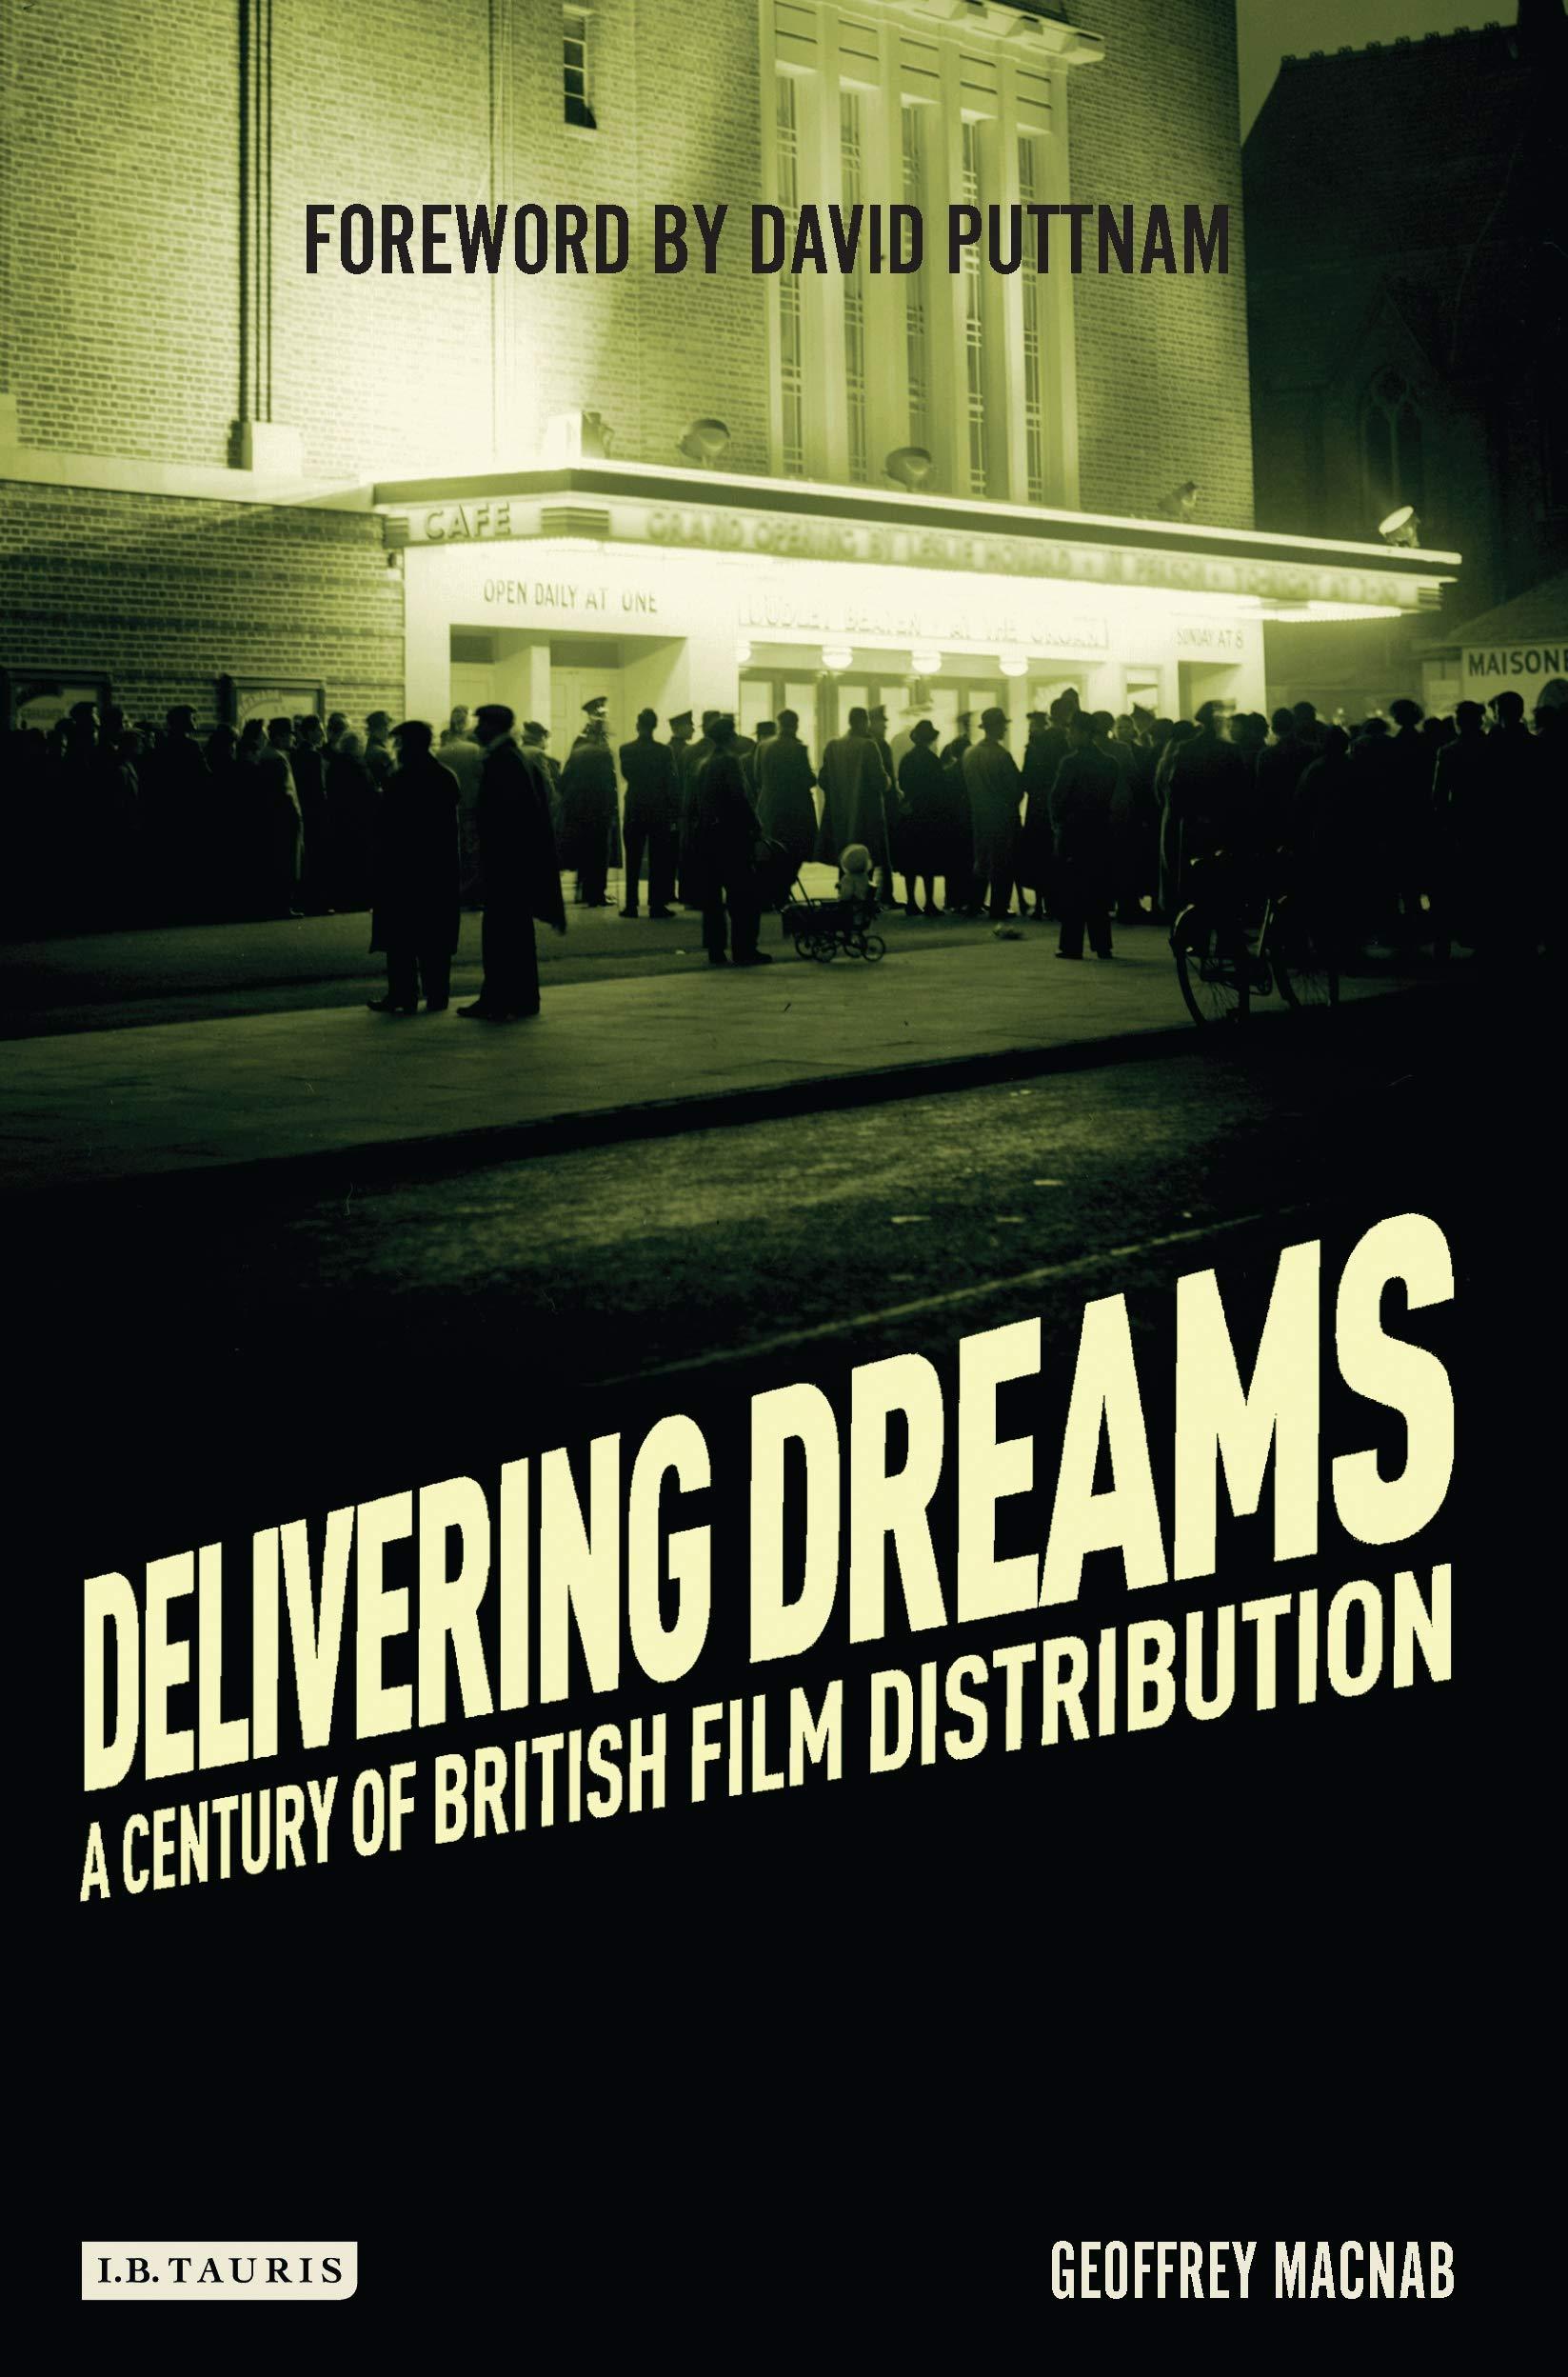 Delivering Dreams: A Century of British Film Distribution